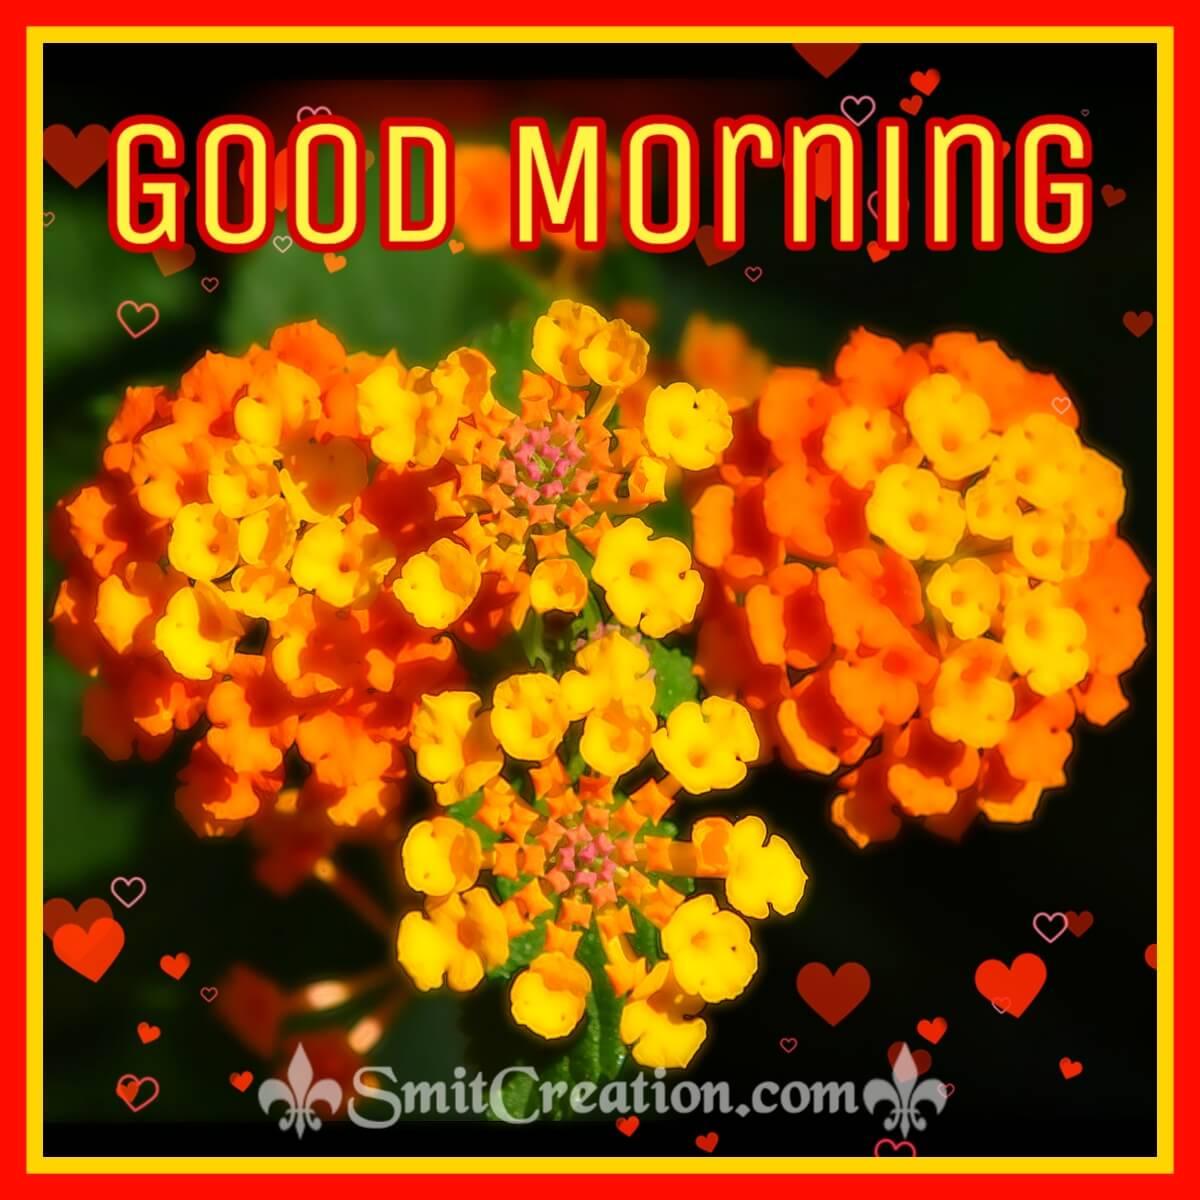 Good Morning Shining Lantana Flower